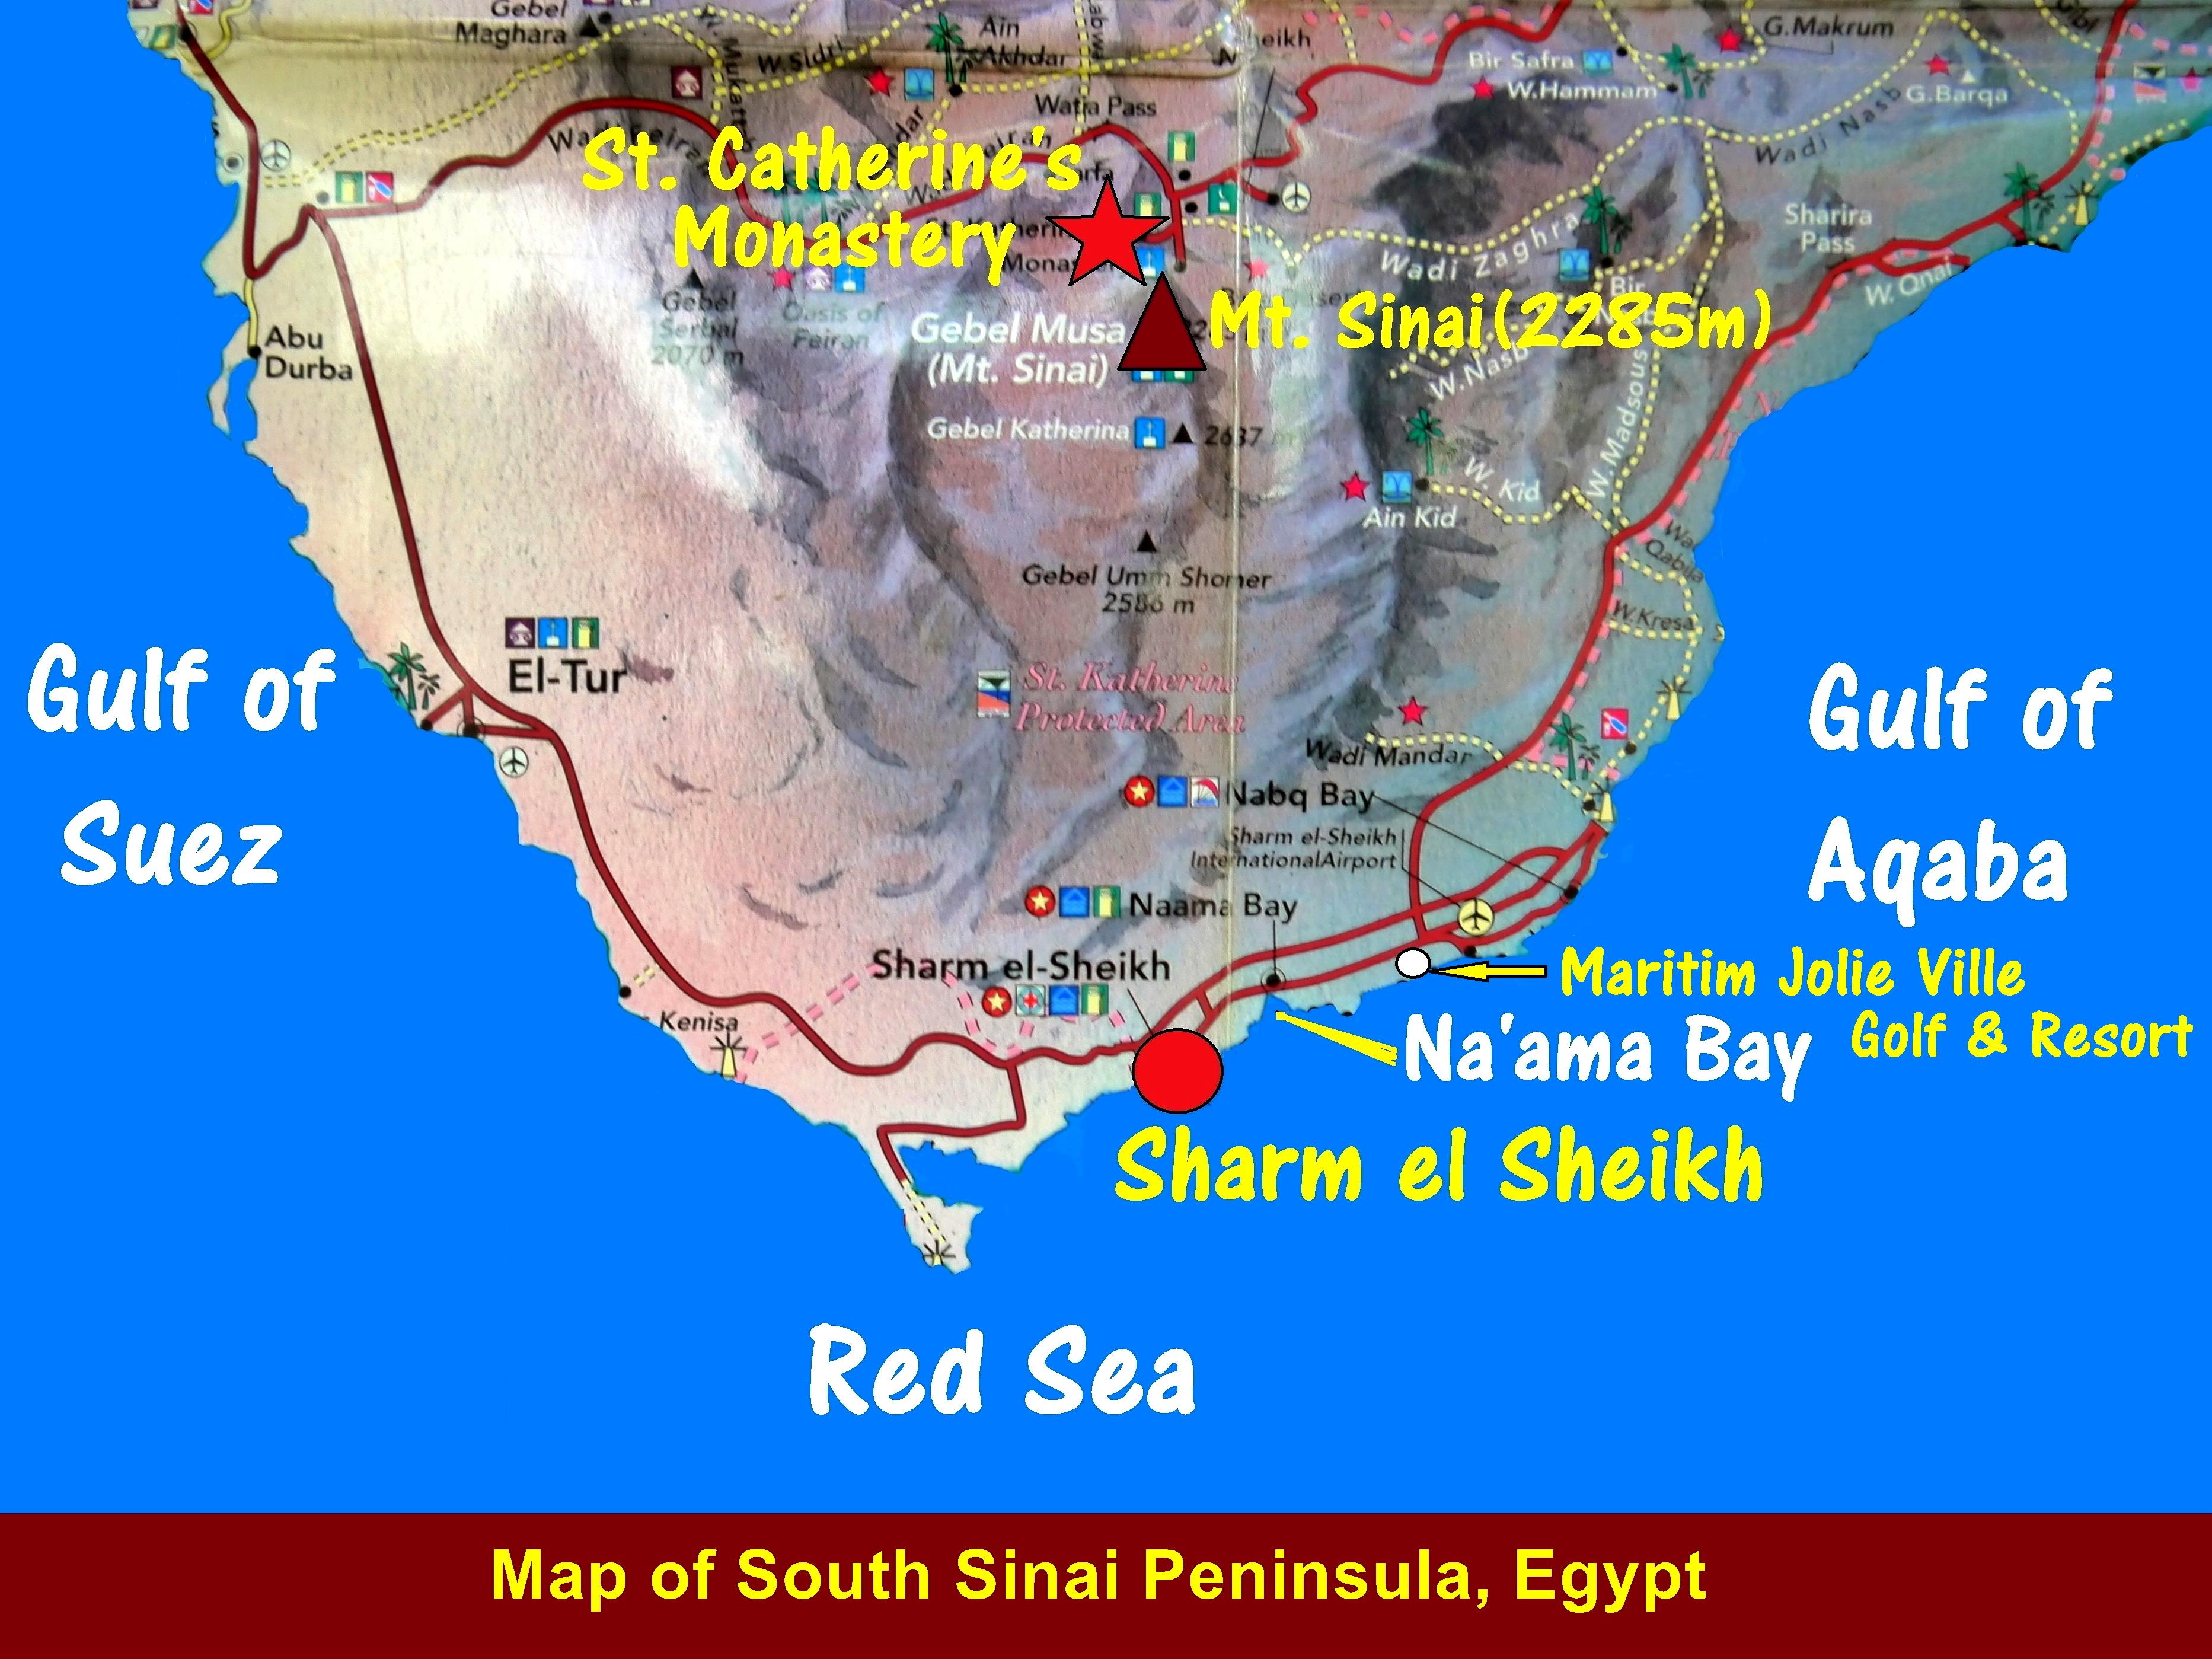 Egypt travel part ix mount sinai st catherines monastery and map showing the southern part of sinai peninsula egypt gumiabroncs Choice Image